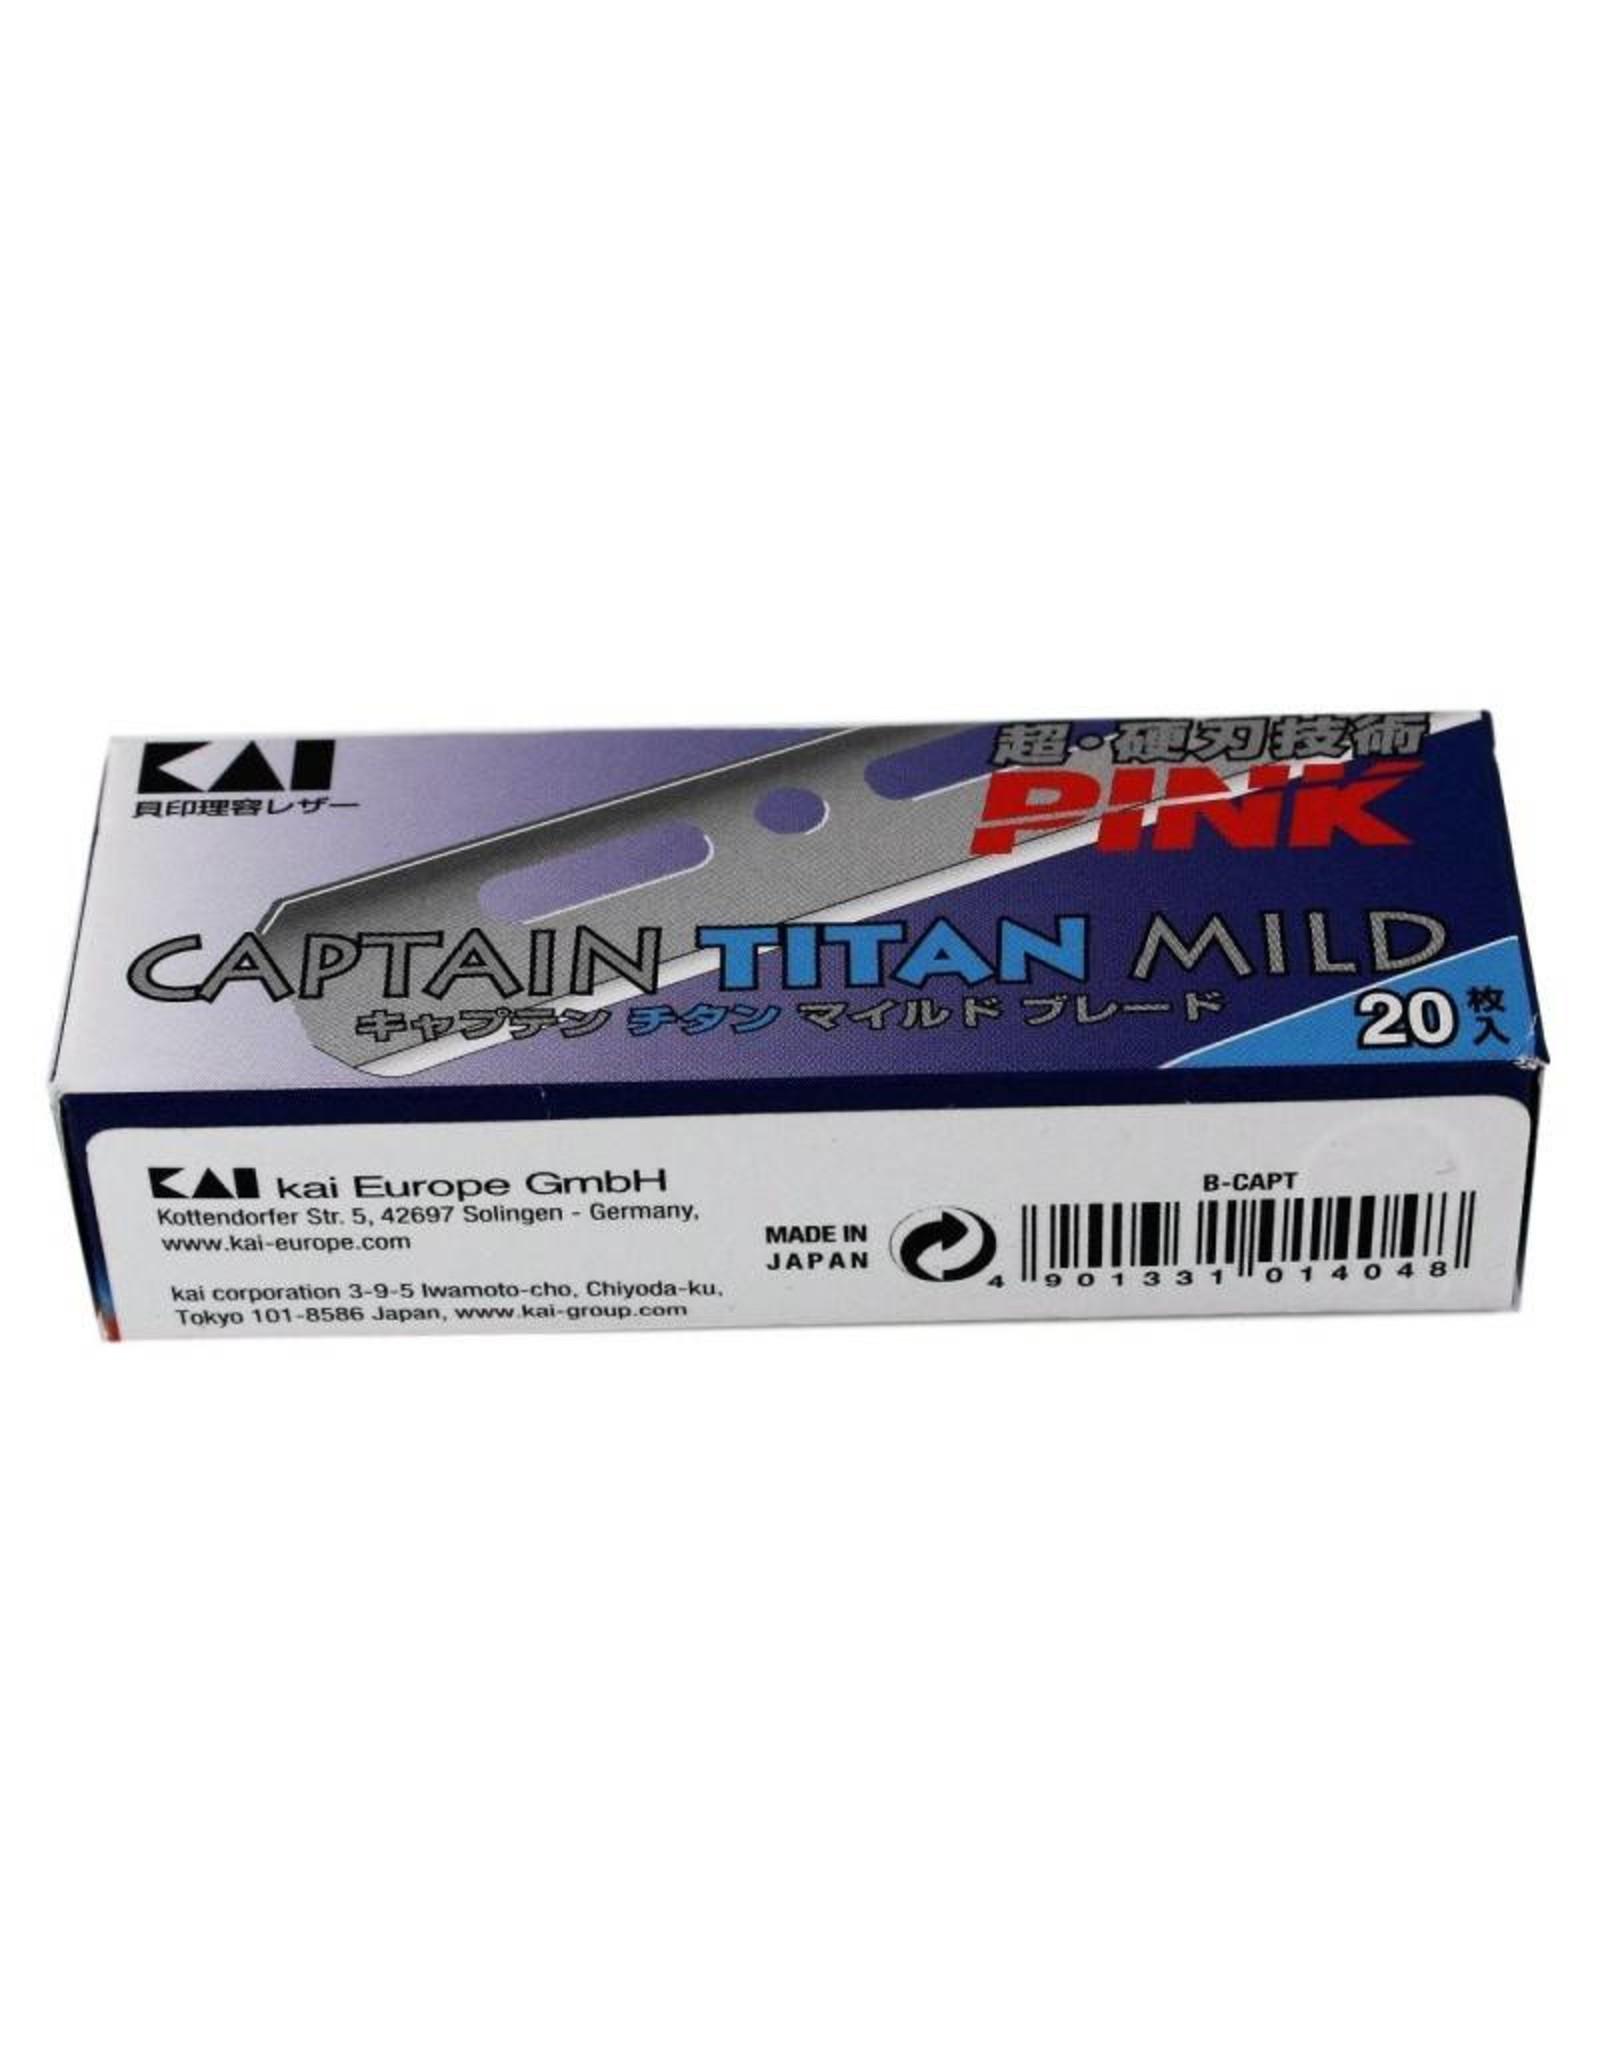 Kasho Made in Japan  5 x 20 Stk Kai Captain Titan Mild Pink Razor Blades